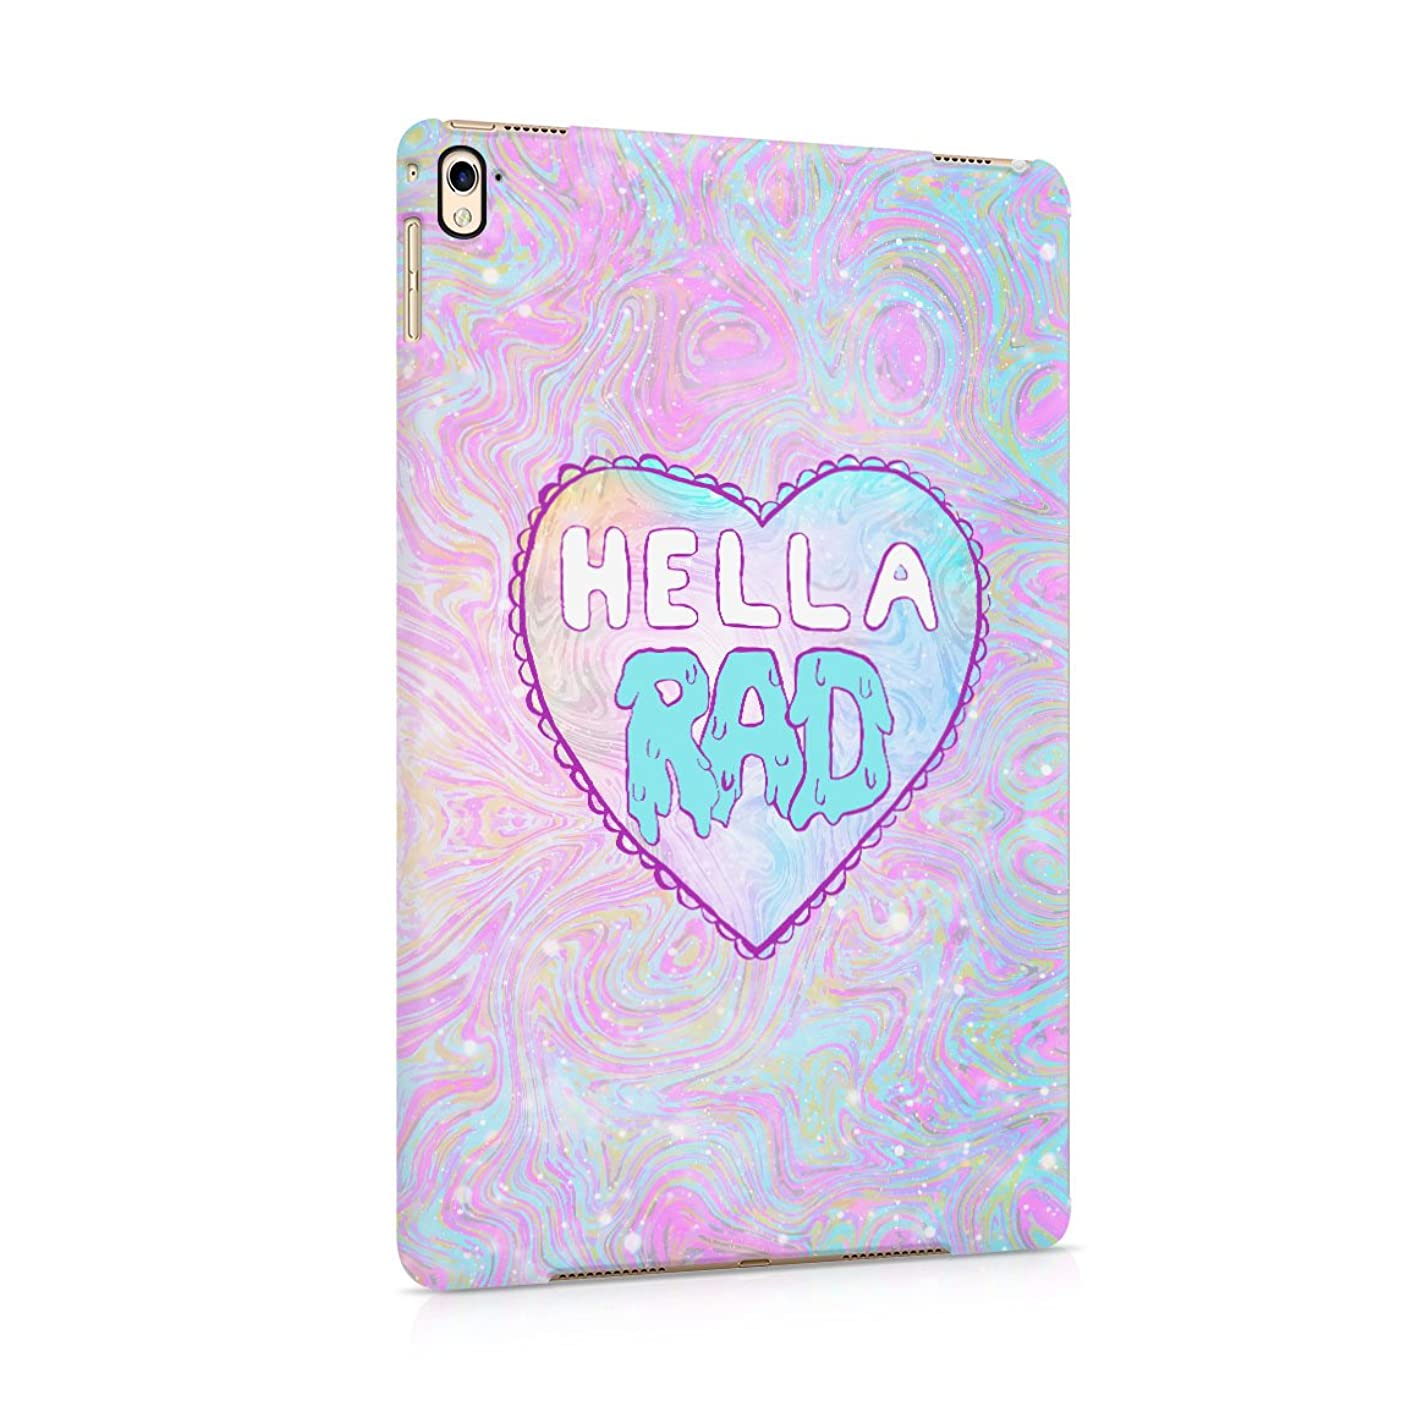 Hella RAD Psychedelic Tie Dye Hard Plastic Tablet Case For iPad Pro 9.7